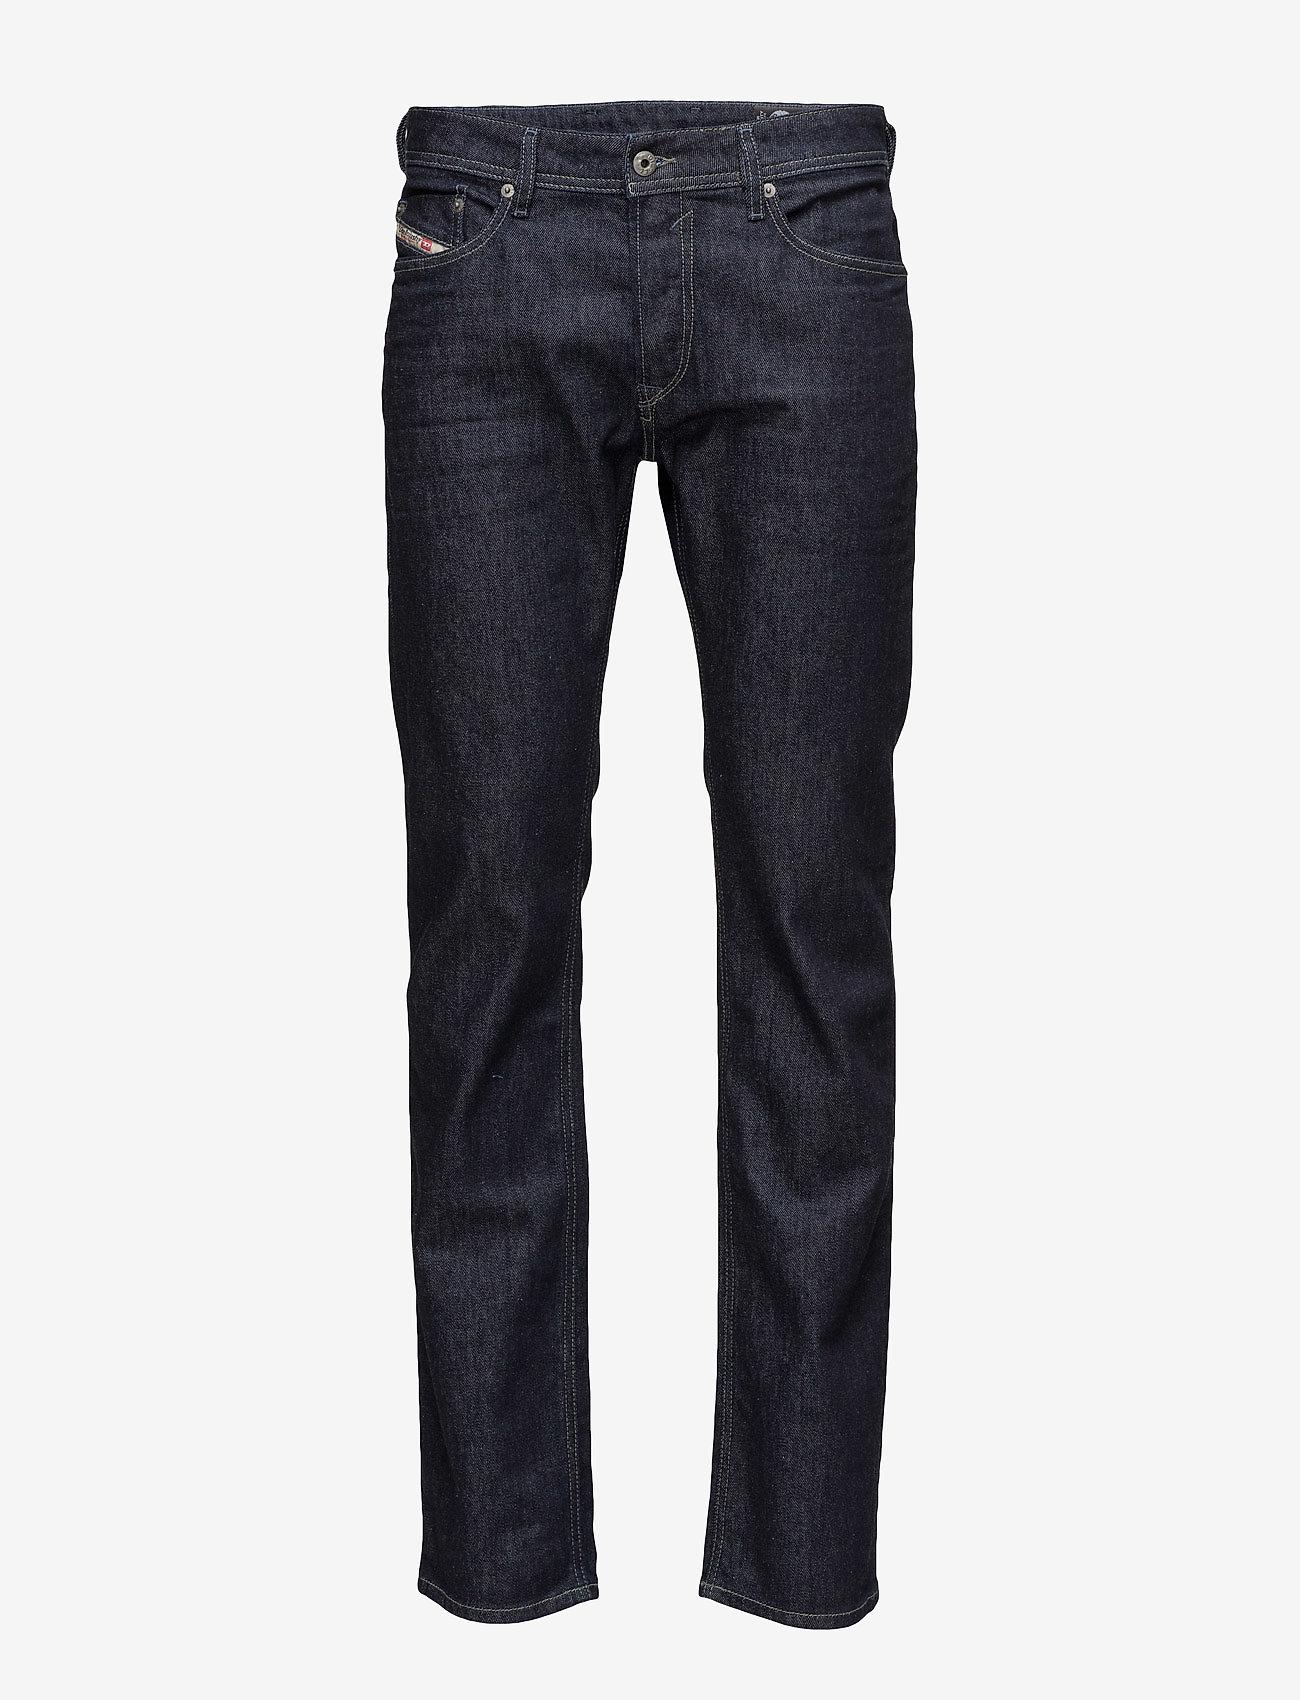 Diesel Men - WAYKEE TROUSERS - regular jeans - denim - 1